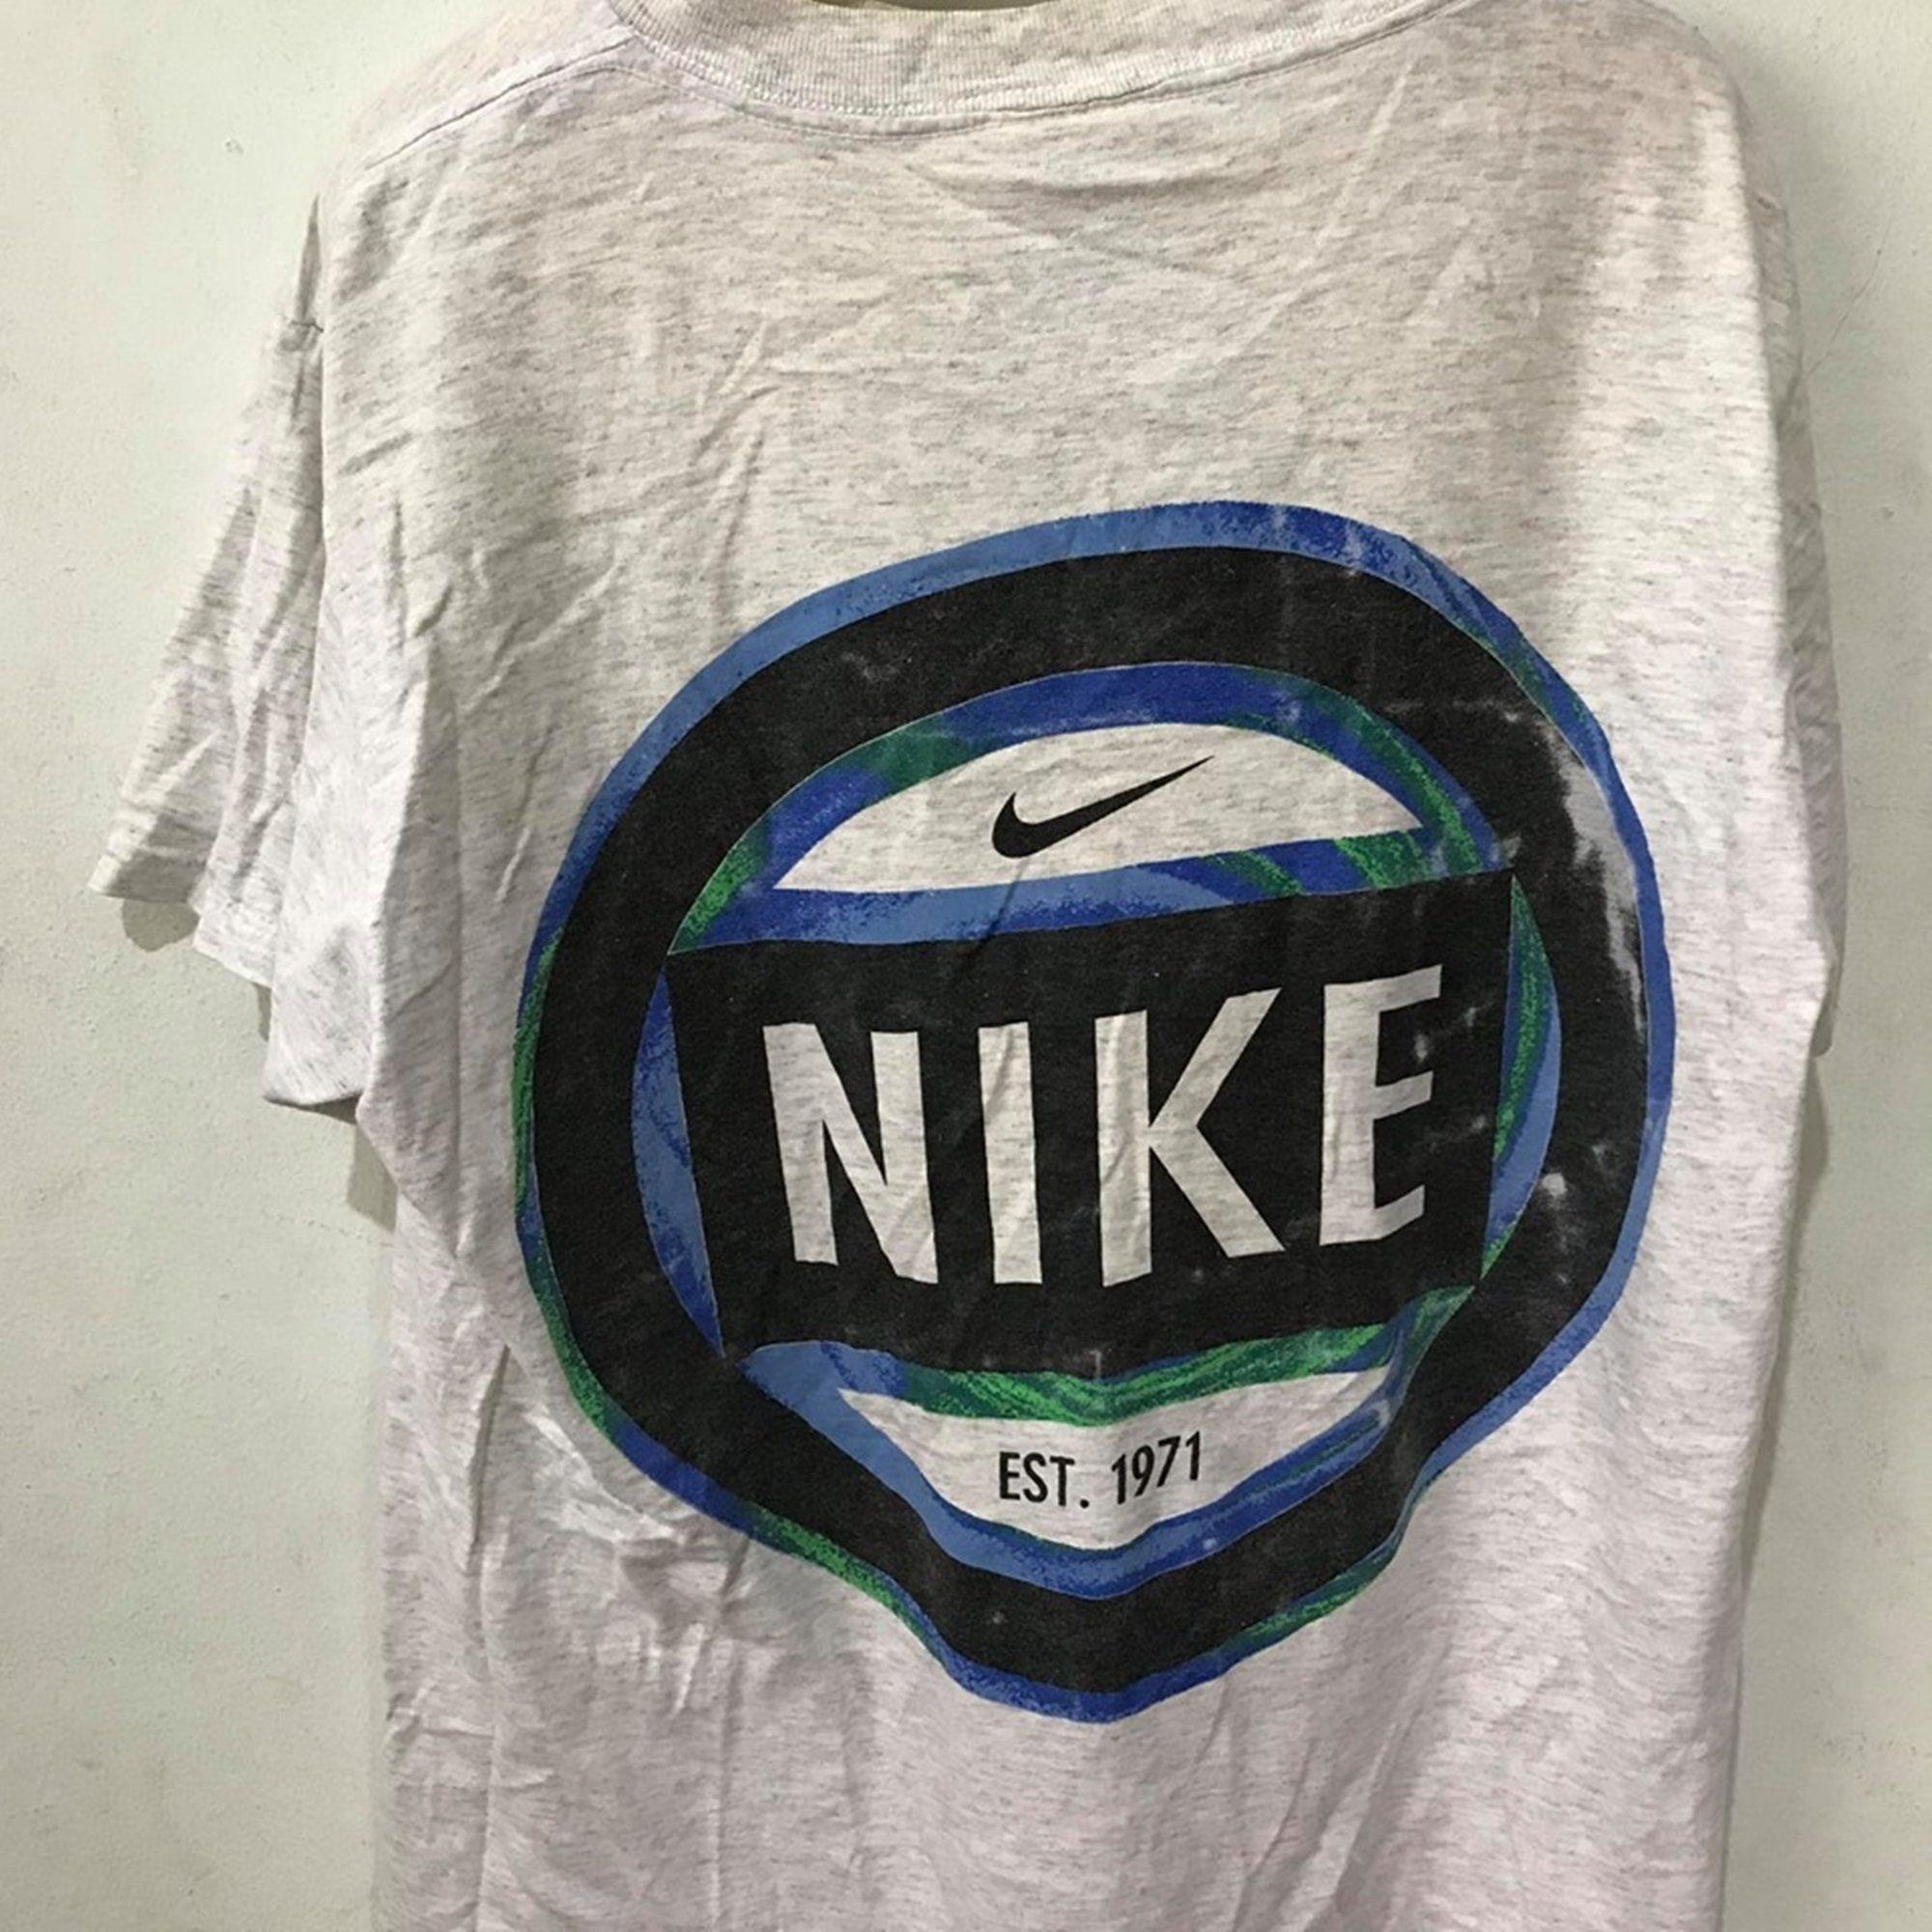 Vintage Nike Shirt Size L Free Shipping 90s Nike Just Do It Swoosh Shirt Nike Vintage Vintageclothing 90s Tshirt Vintageshirt Vintagetshirt Etsy Etsyse